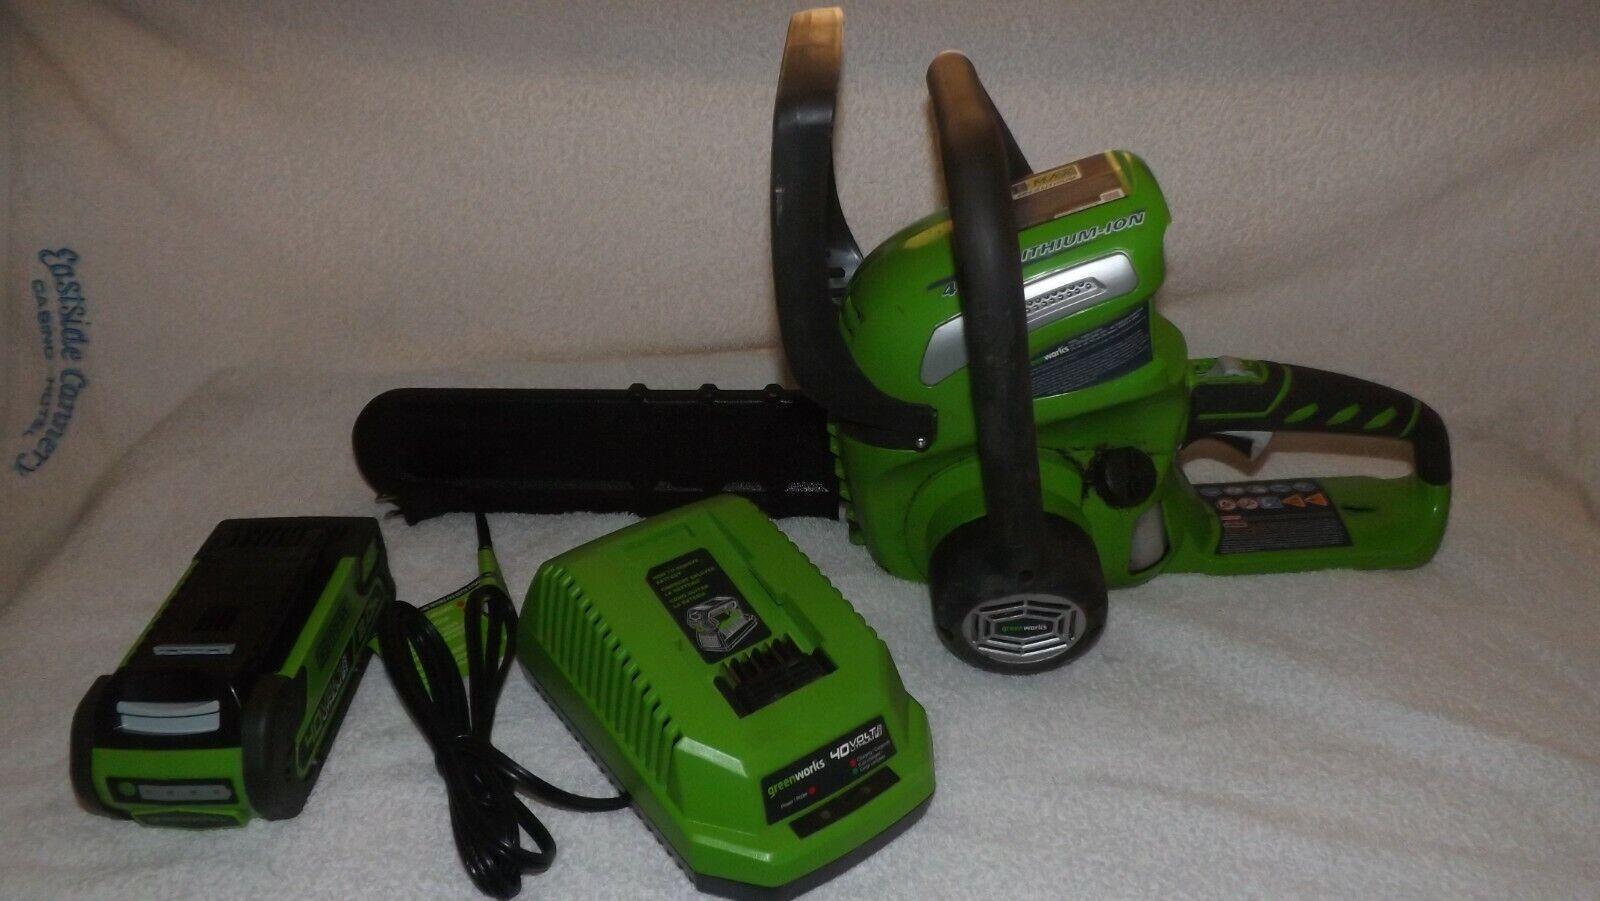 20262 12 inch 40v cordless chainsaw green